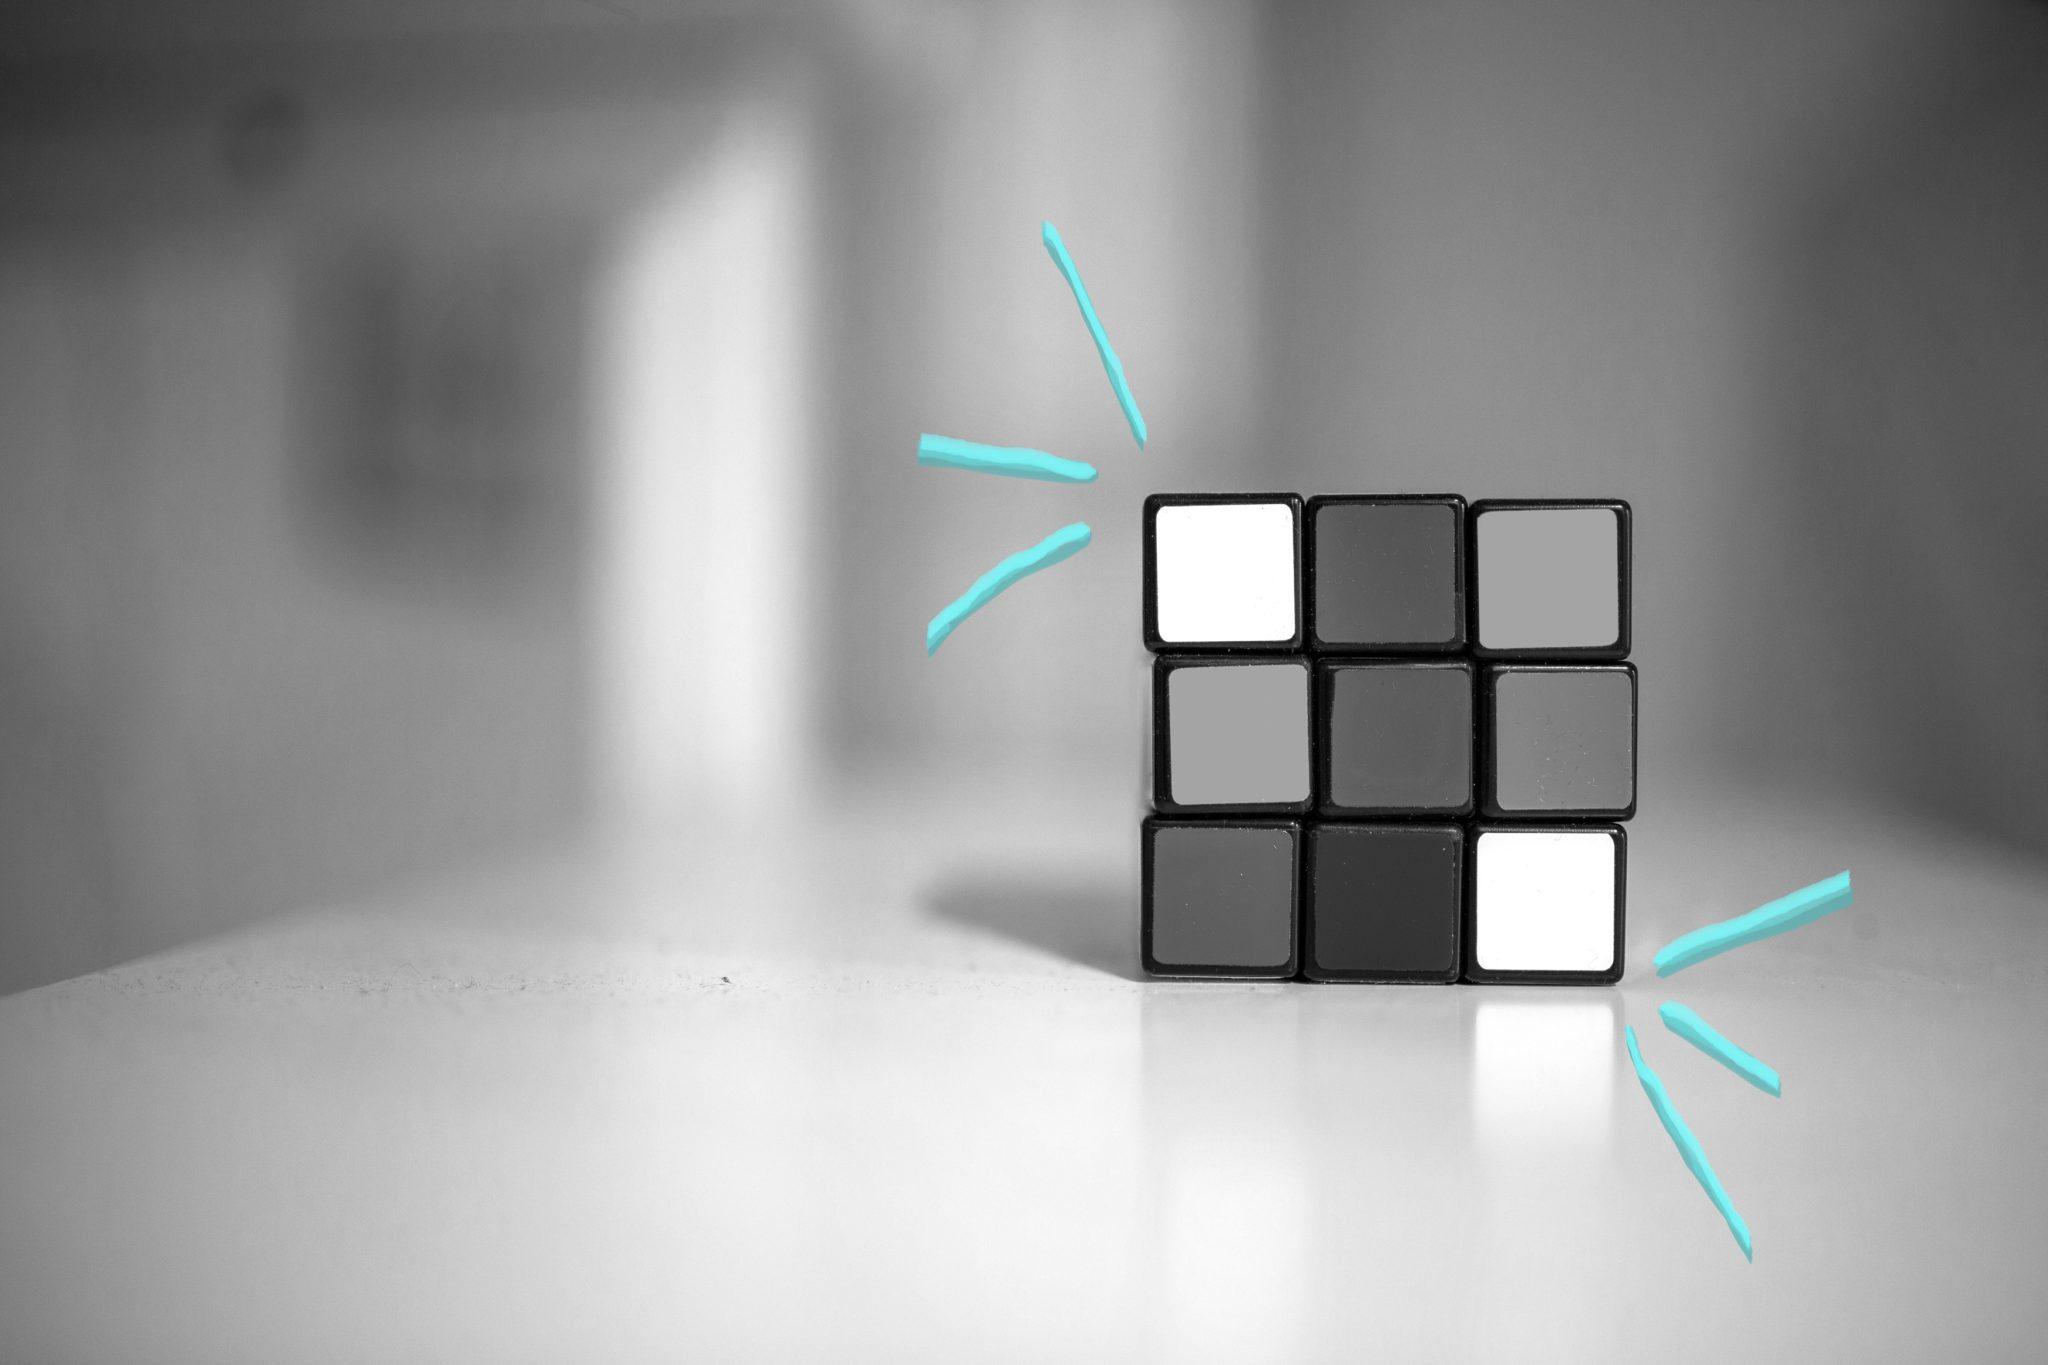 No vendas, resuelve problemas a cambio de una tarifa - Txell Costa Group